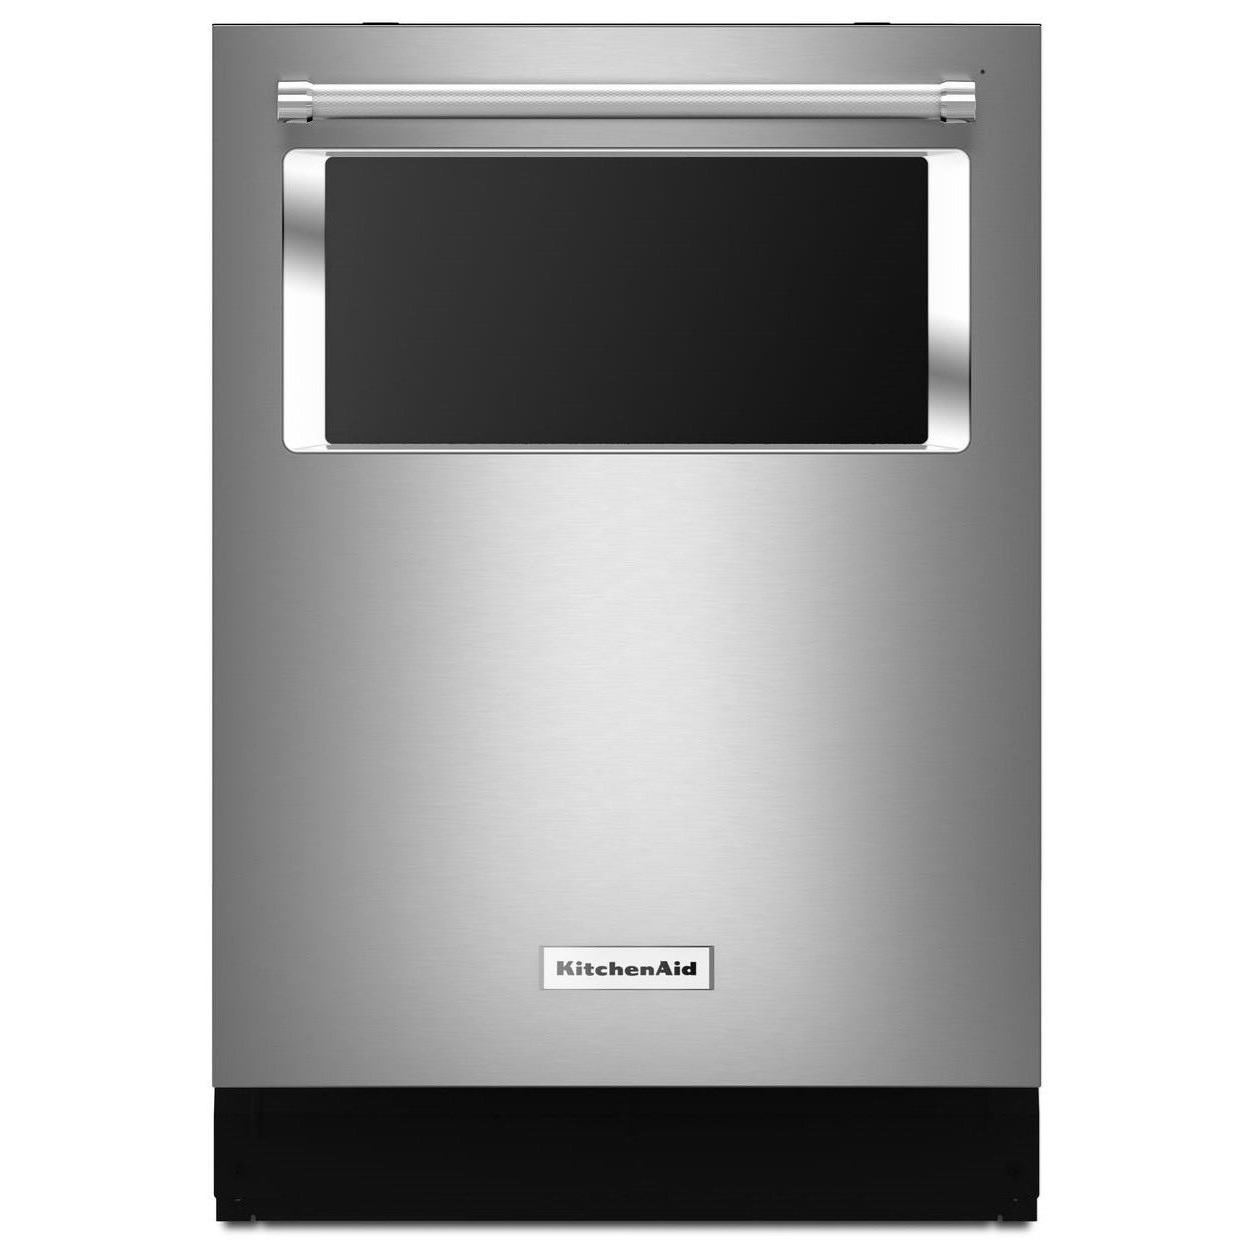 KitchenAid KitchenAid Dishwashers 44 dBA Windwo Dishwasher - Item Number: KDTM384ESS